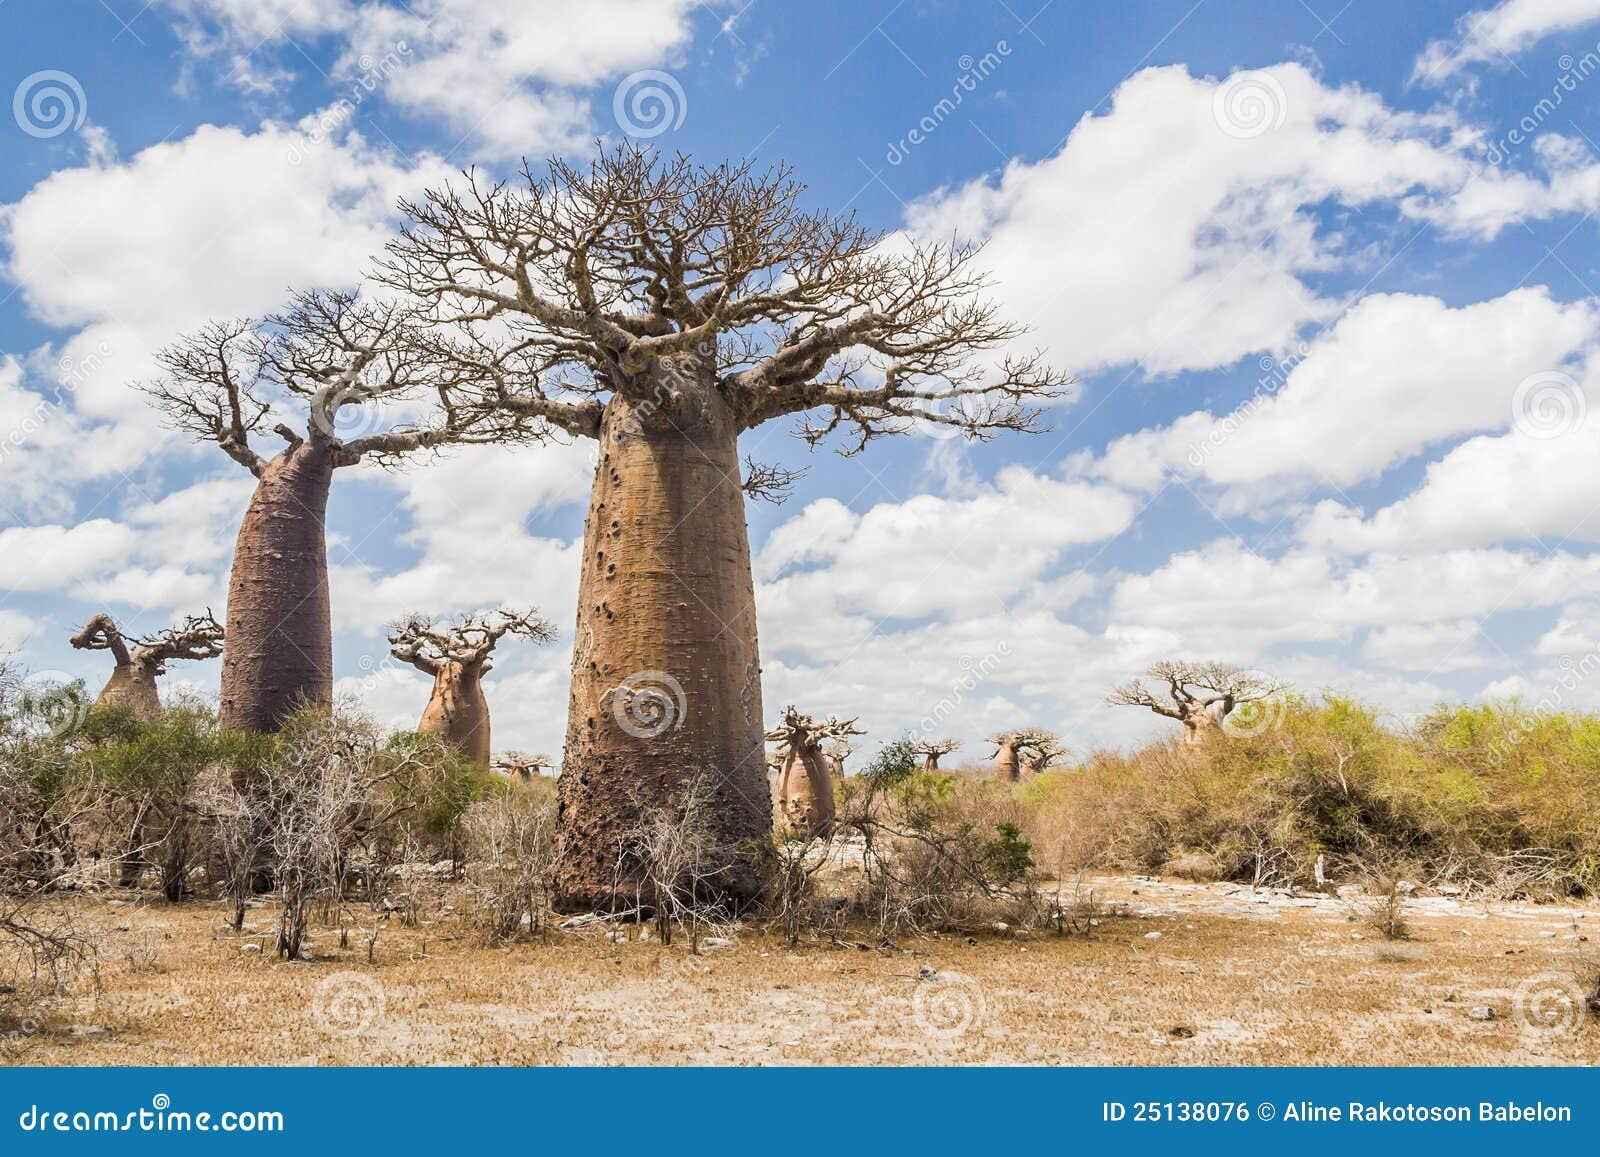 arbres et savane de baobab photo stock image du ext rieur 25138076. Black Bedroom Furniture Sets. Home Design Ideas